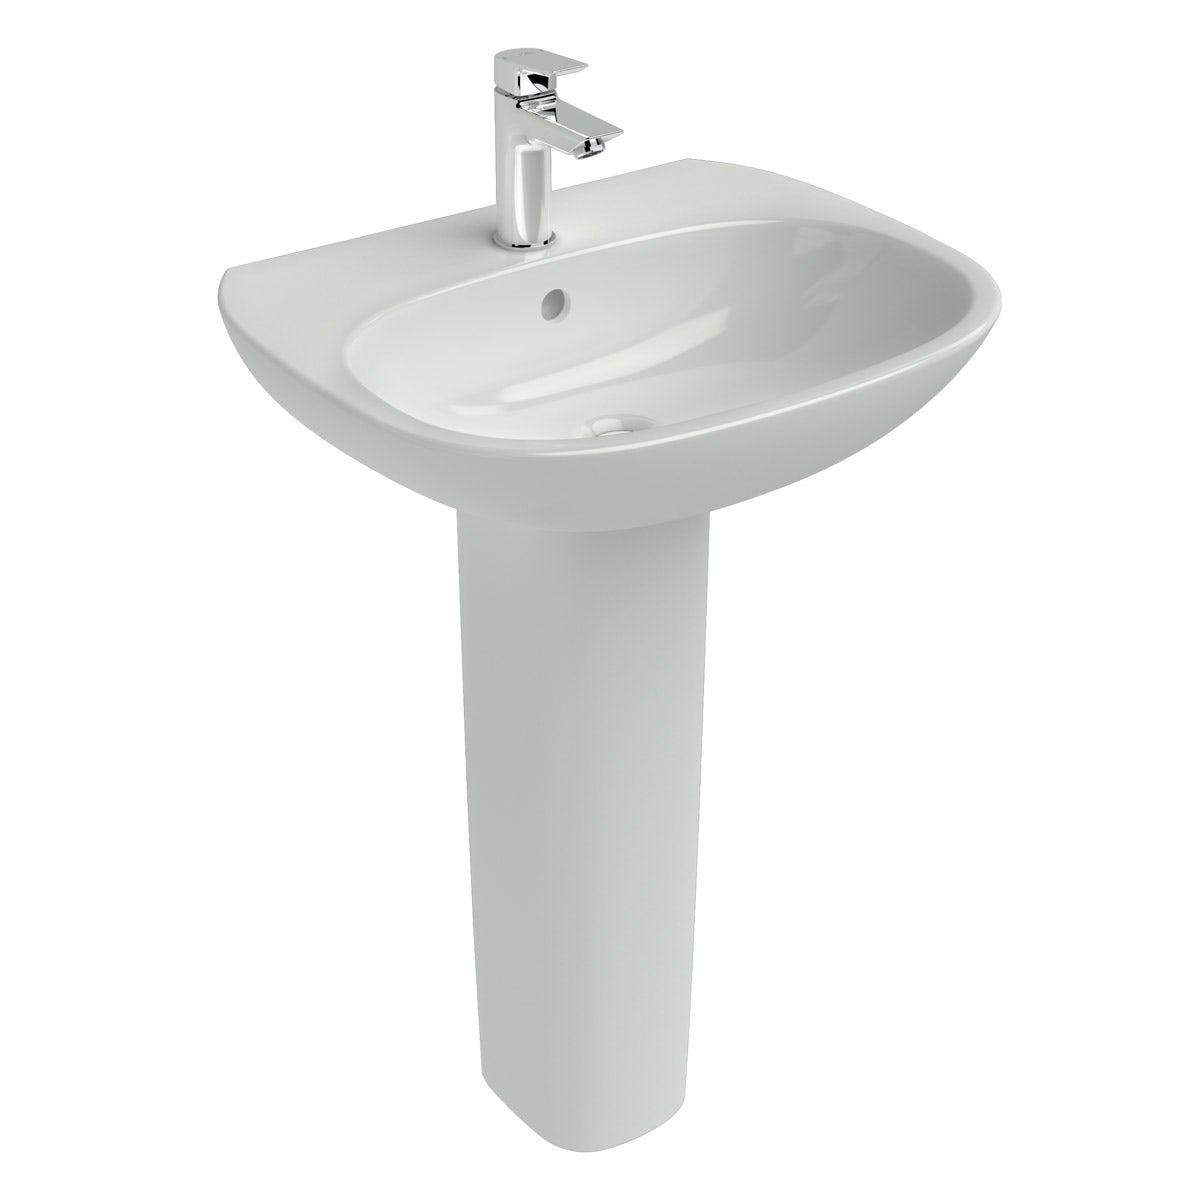 Ideal standard tesi 1 tap hole full pedestal basin for Ideal standard diagonal